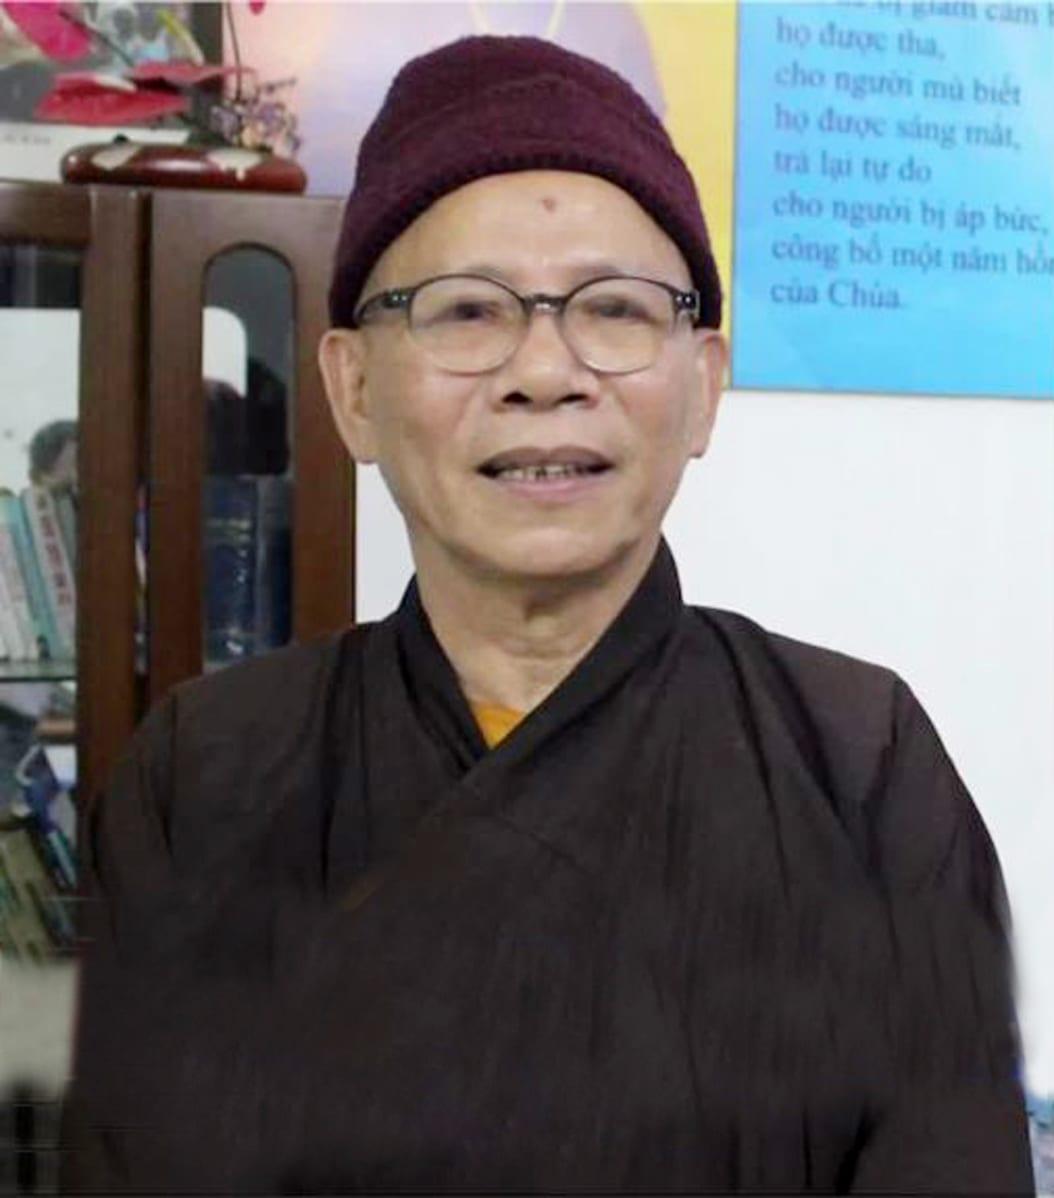 DP-Giai-Nguyen-Kim-Dien-2019-Thich-Khong-Tanh